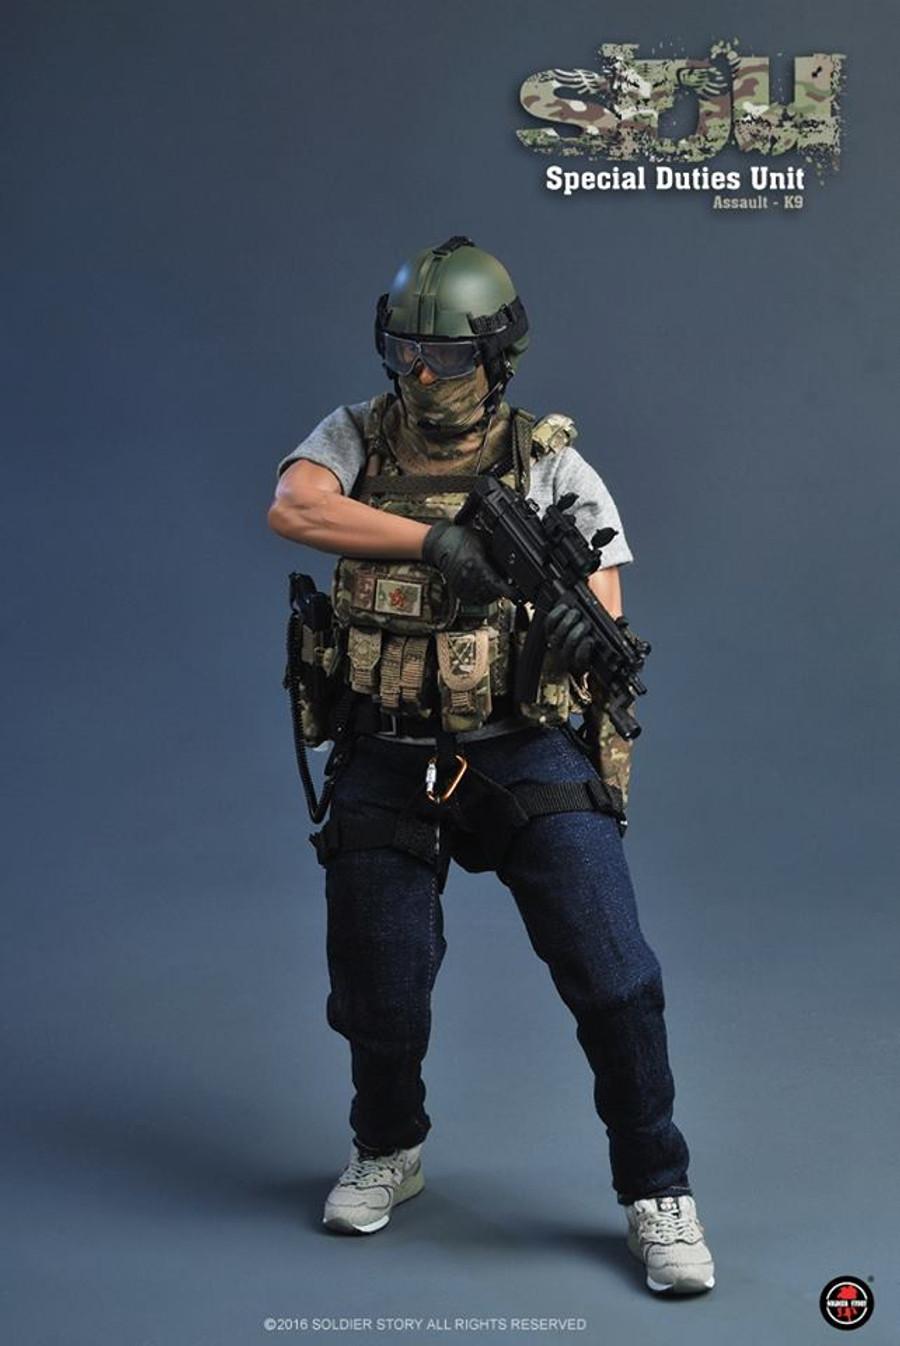 Soldier Story - Special Duties Unit - Assaulter-K9